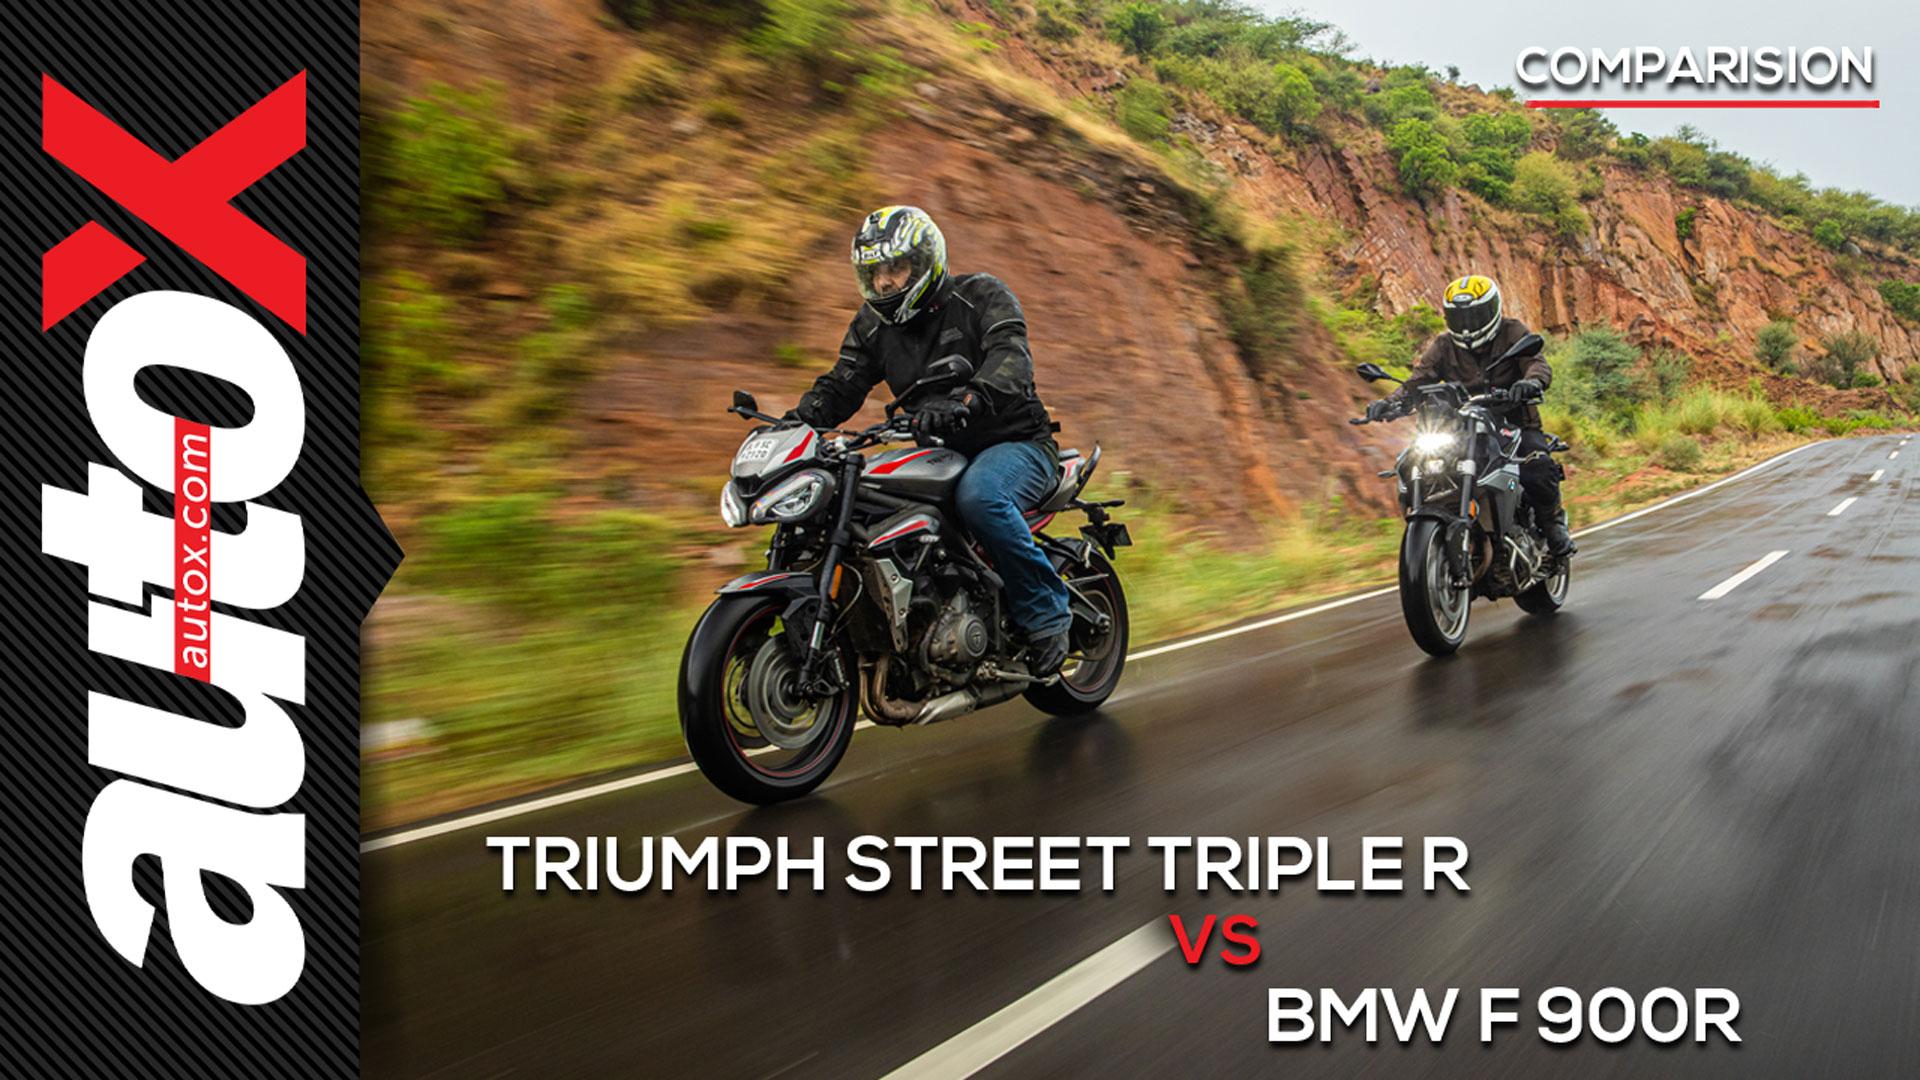 BMW F 900 R Vs Triumph Street Triple R: The Best Mid-Segment Bikes   Comparison   autoX